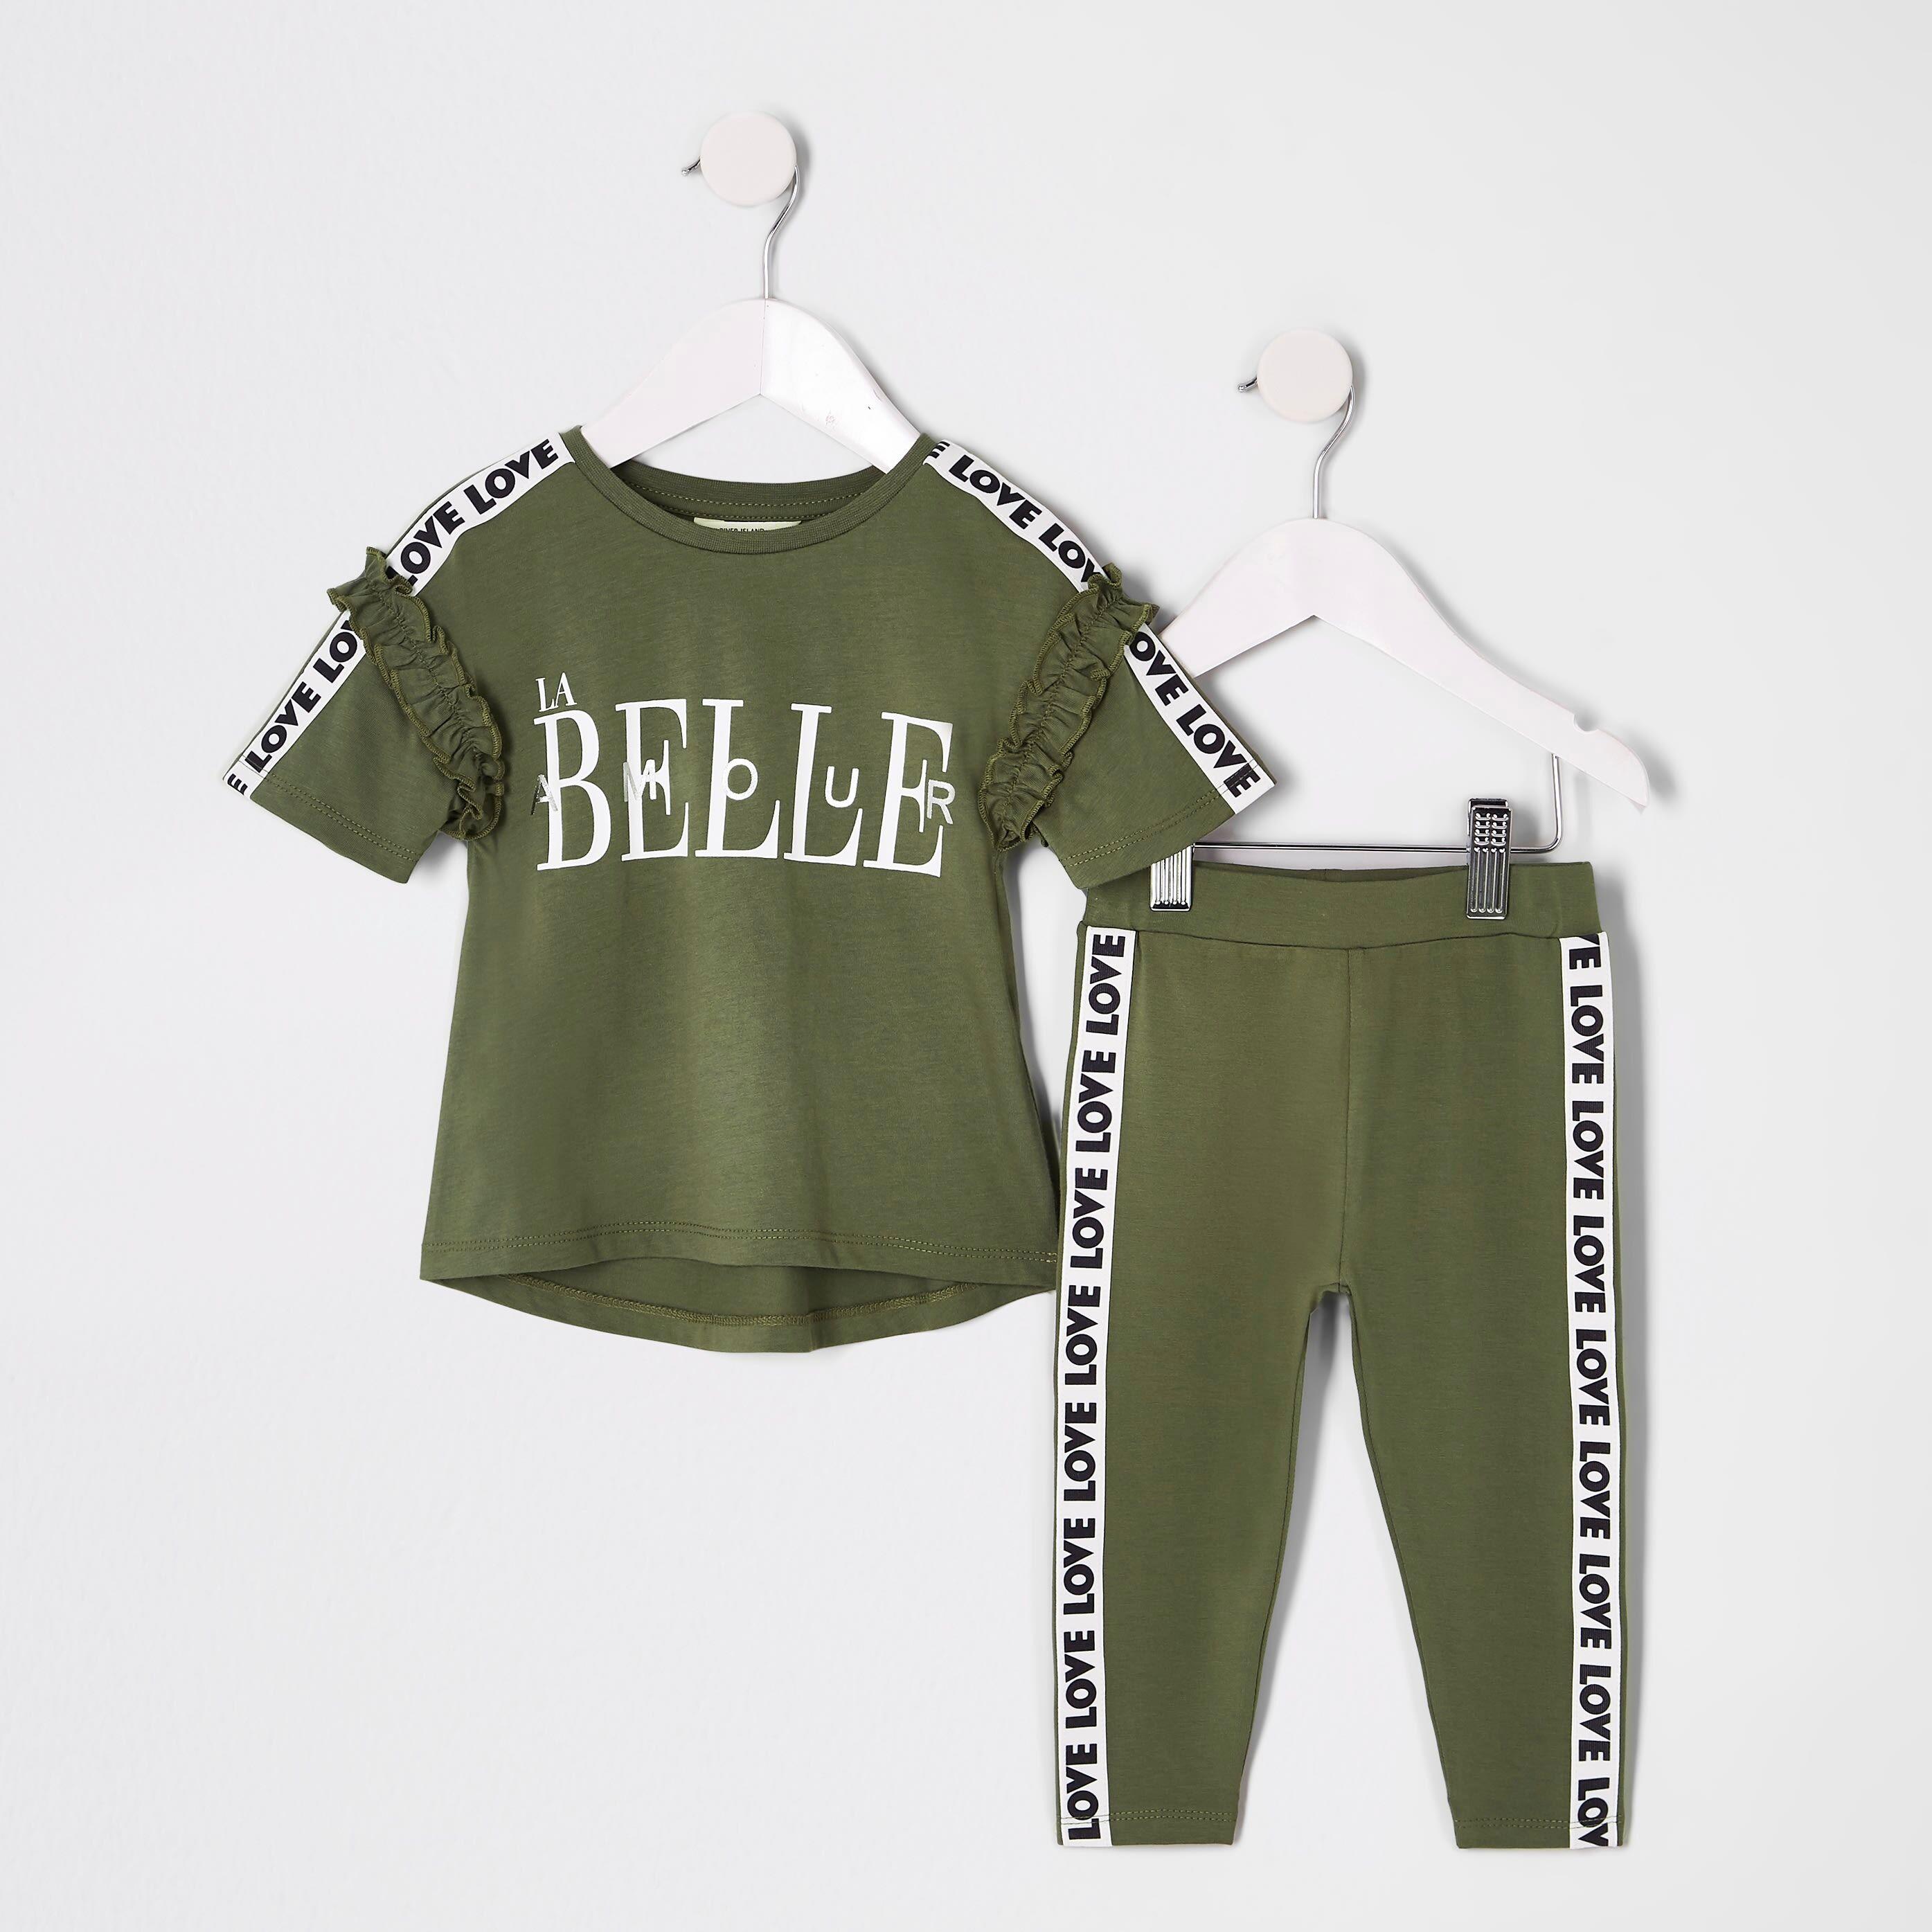 River Island Baby Girls Khaki 'La belle' T-shirt outfit (6-9 Mths)